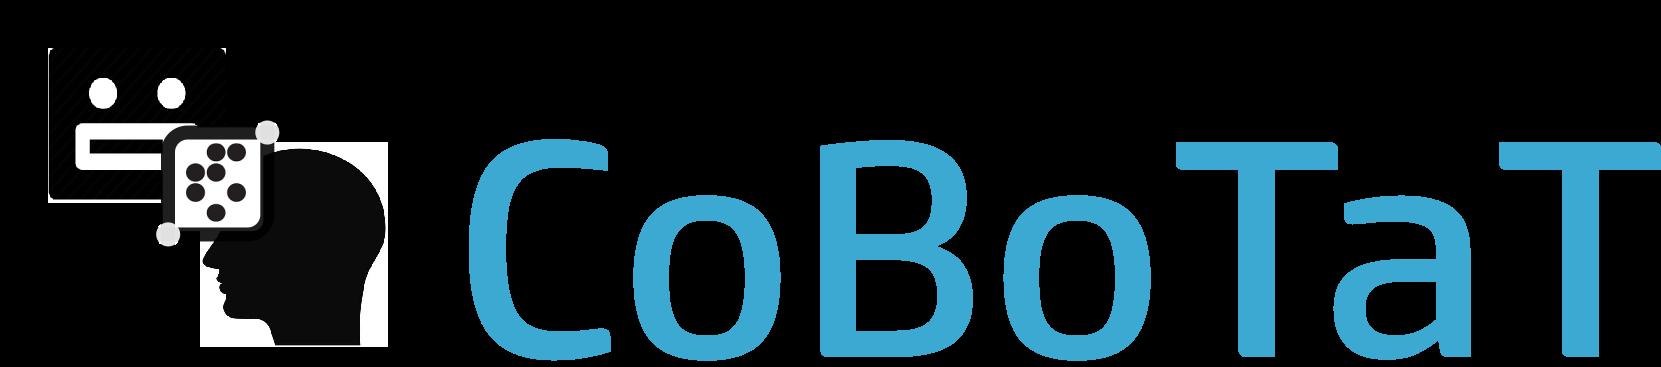 Collaborative Robotics Lab - Jozef Stefan Institute